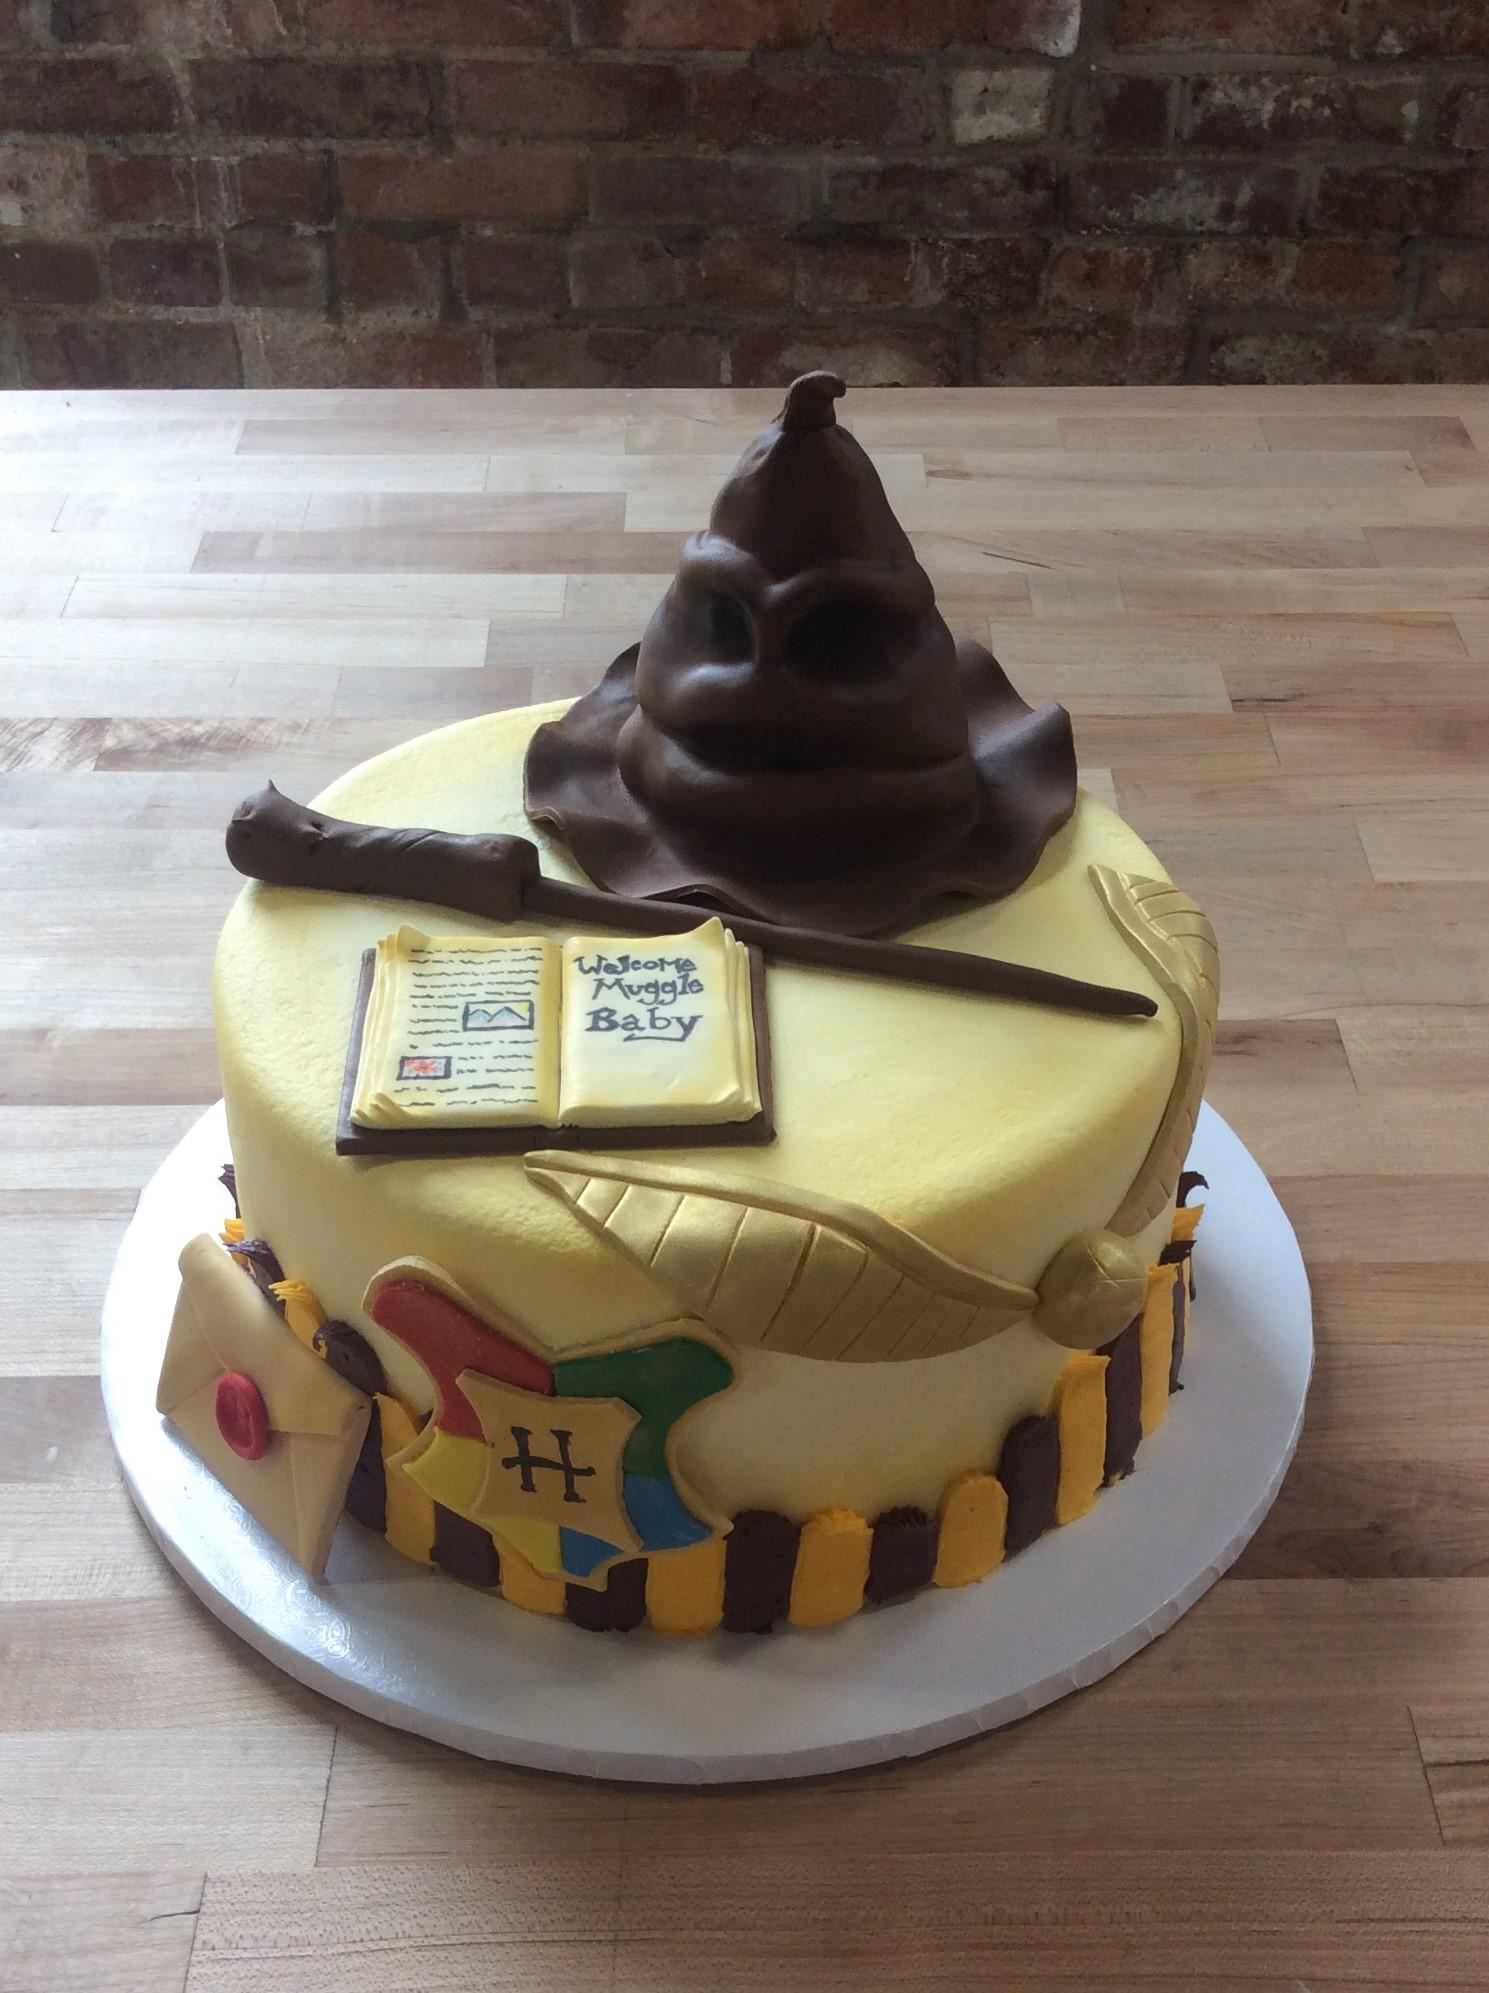 Round Cake With Fondant Harry Potter Decorations Trefzger S Bakery